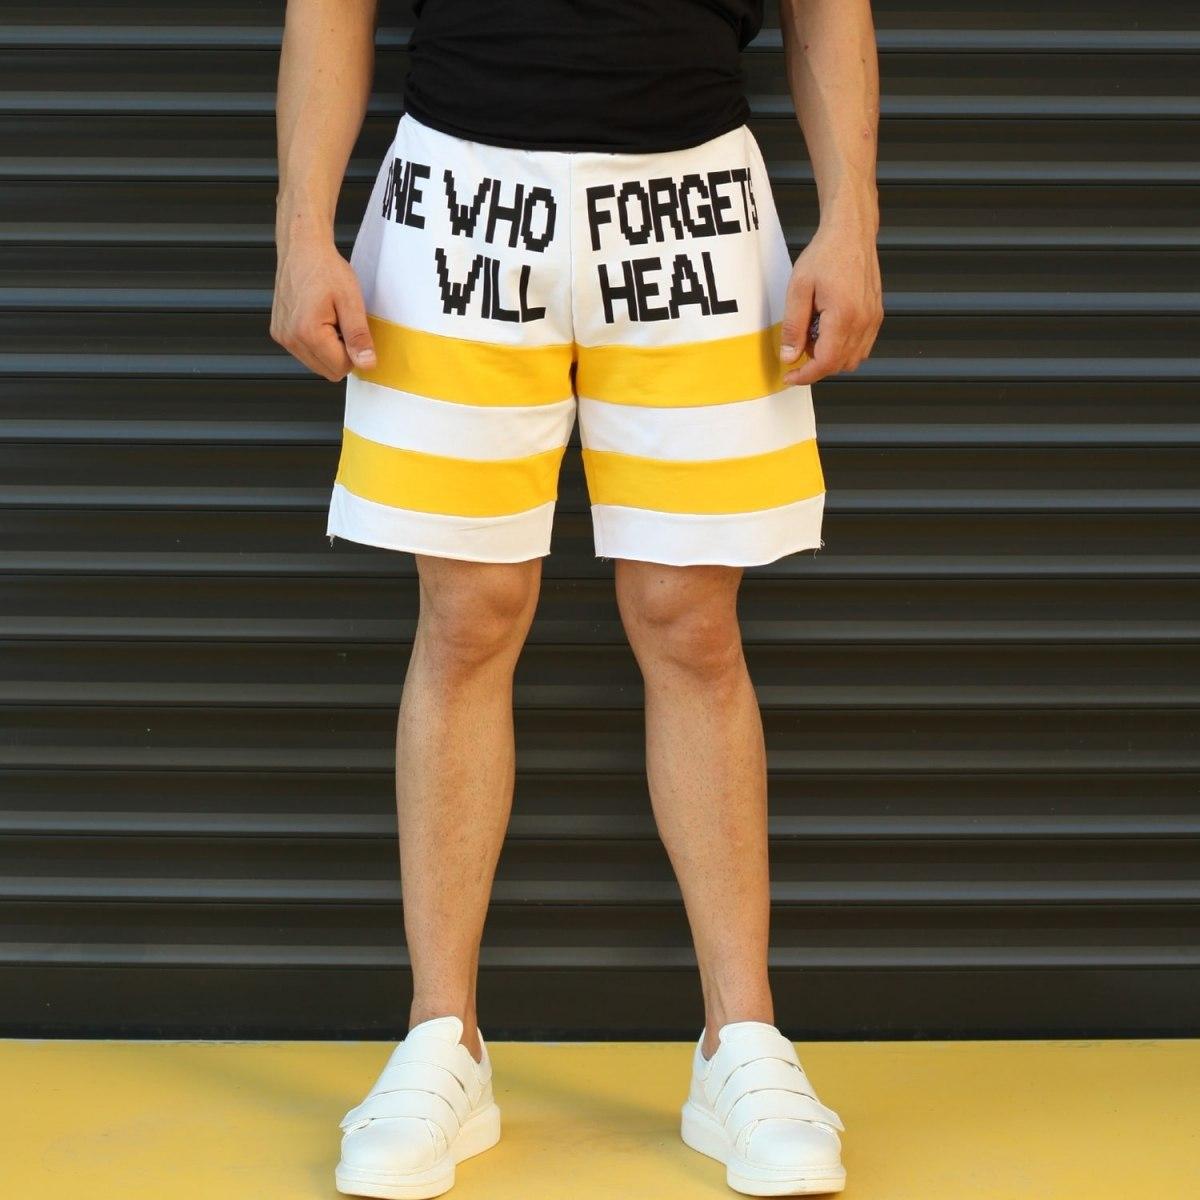 Men's Who Forgets Will Heal Fleece Sport Shorts White Mv Premium Brand - 1